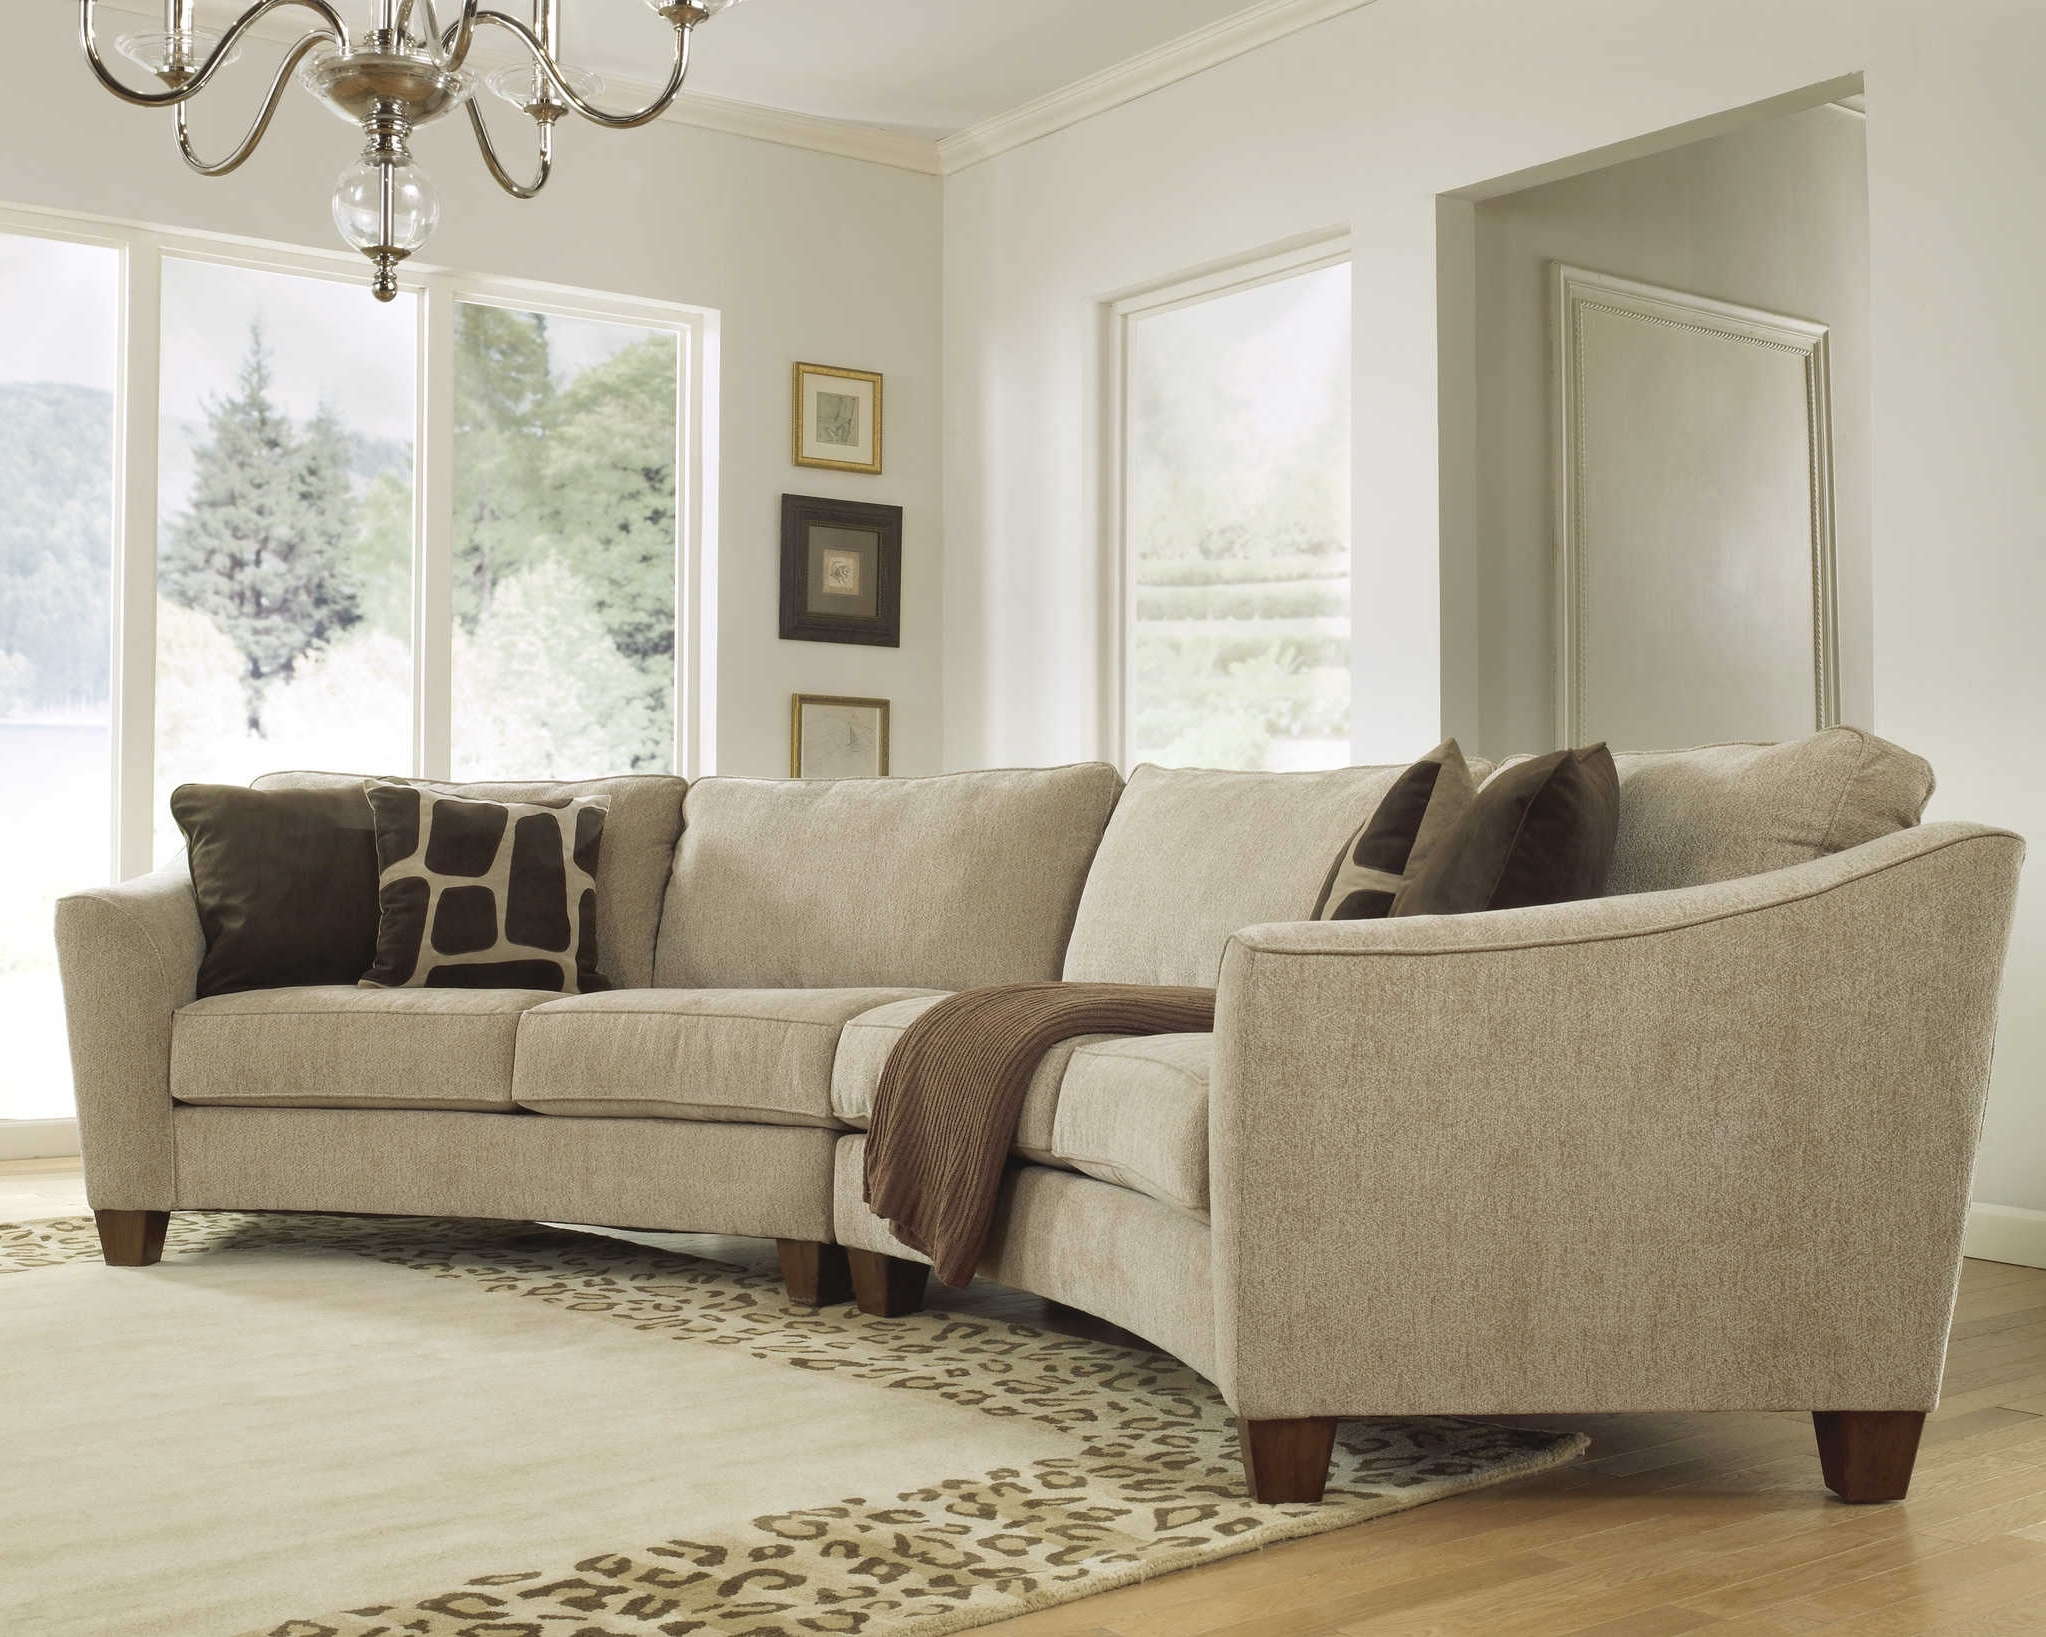 Favorite Wichita Ks Sectional Sofas With Bedroom: Ashley Furniture Wichita Ks Cozy Beautiful White Sofa (View 2 of 15)